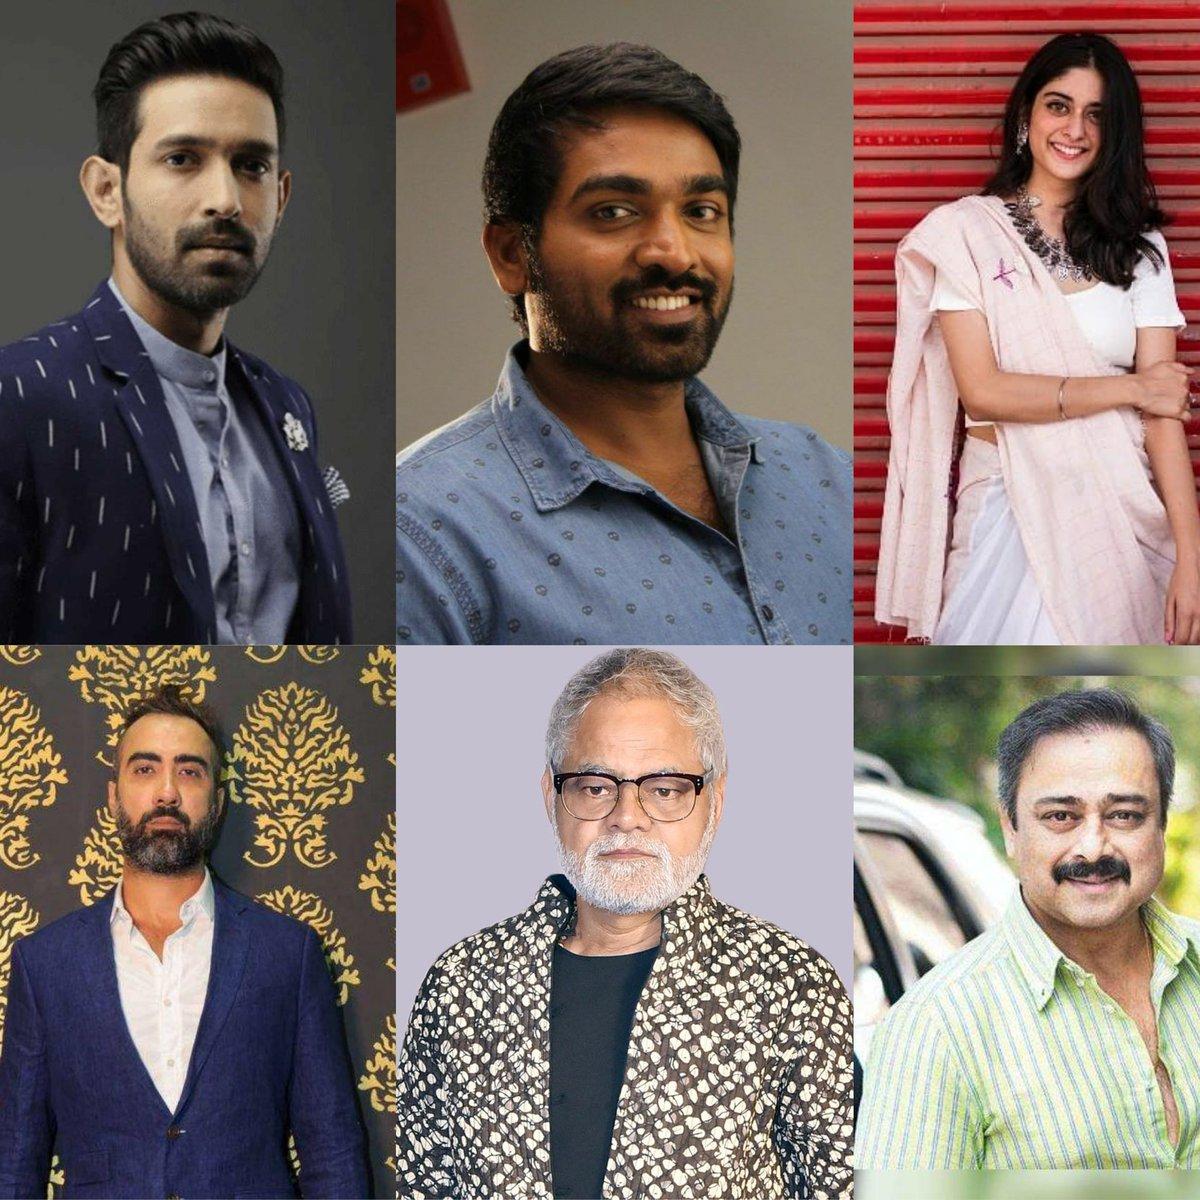 #VikrantMassey, #VijaySethupathi, #TanyaManiktala, #RanvirShorey, #SanjayMishra & #SachinKhedekar with such a strong casts, Cinematographer #SantoshSivan is about to direct #Maanagaram (Remake) of #Master Director #LokeshKanagaraj's work!  Written by #AmitJoshi & #AradhanaDebnath